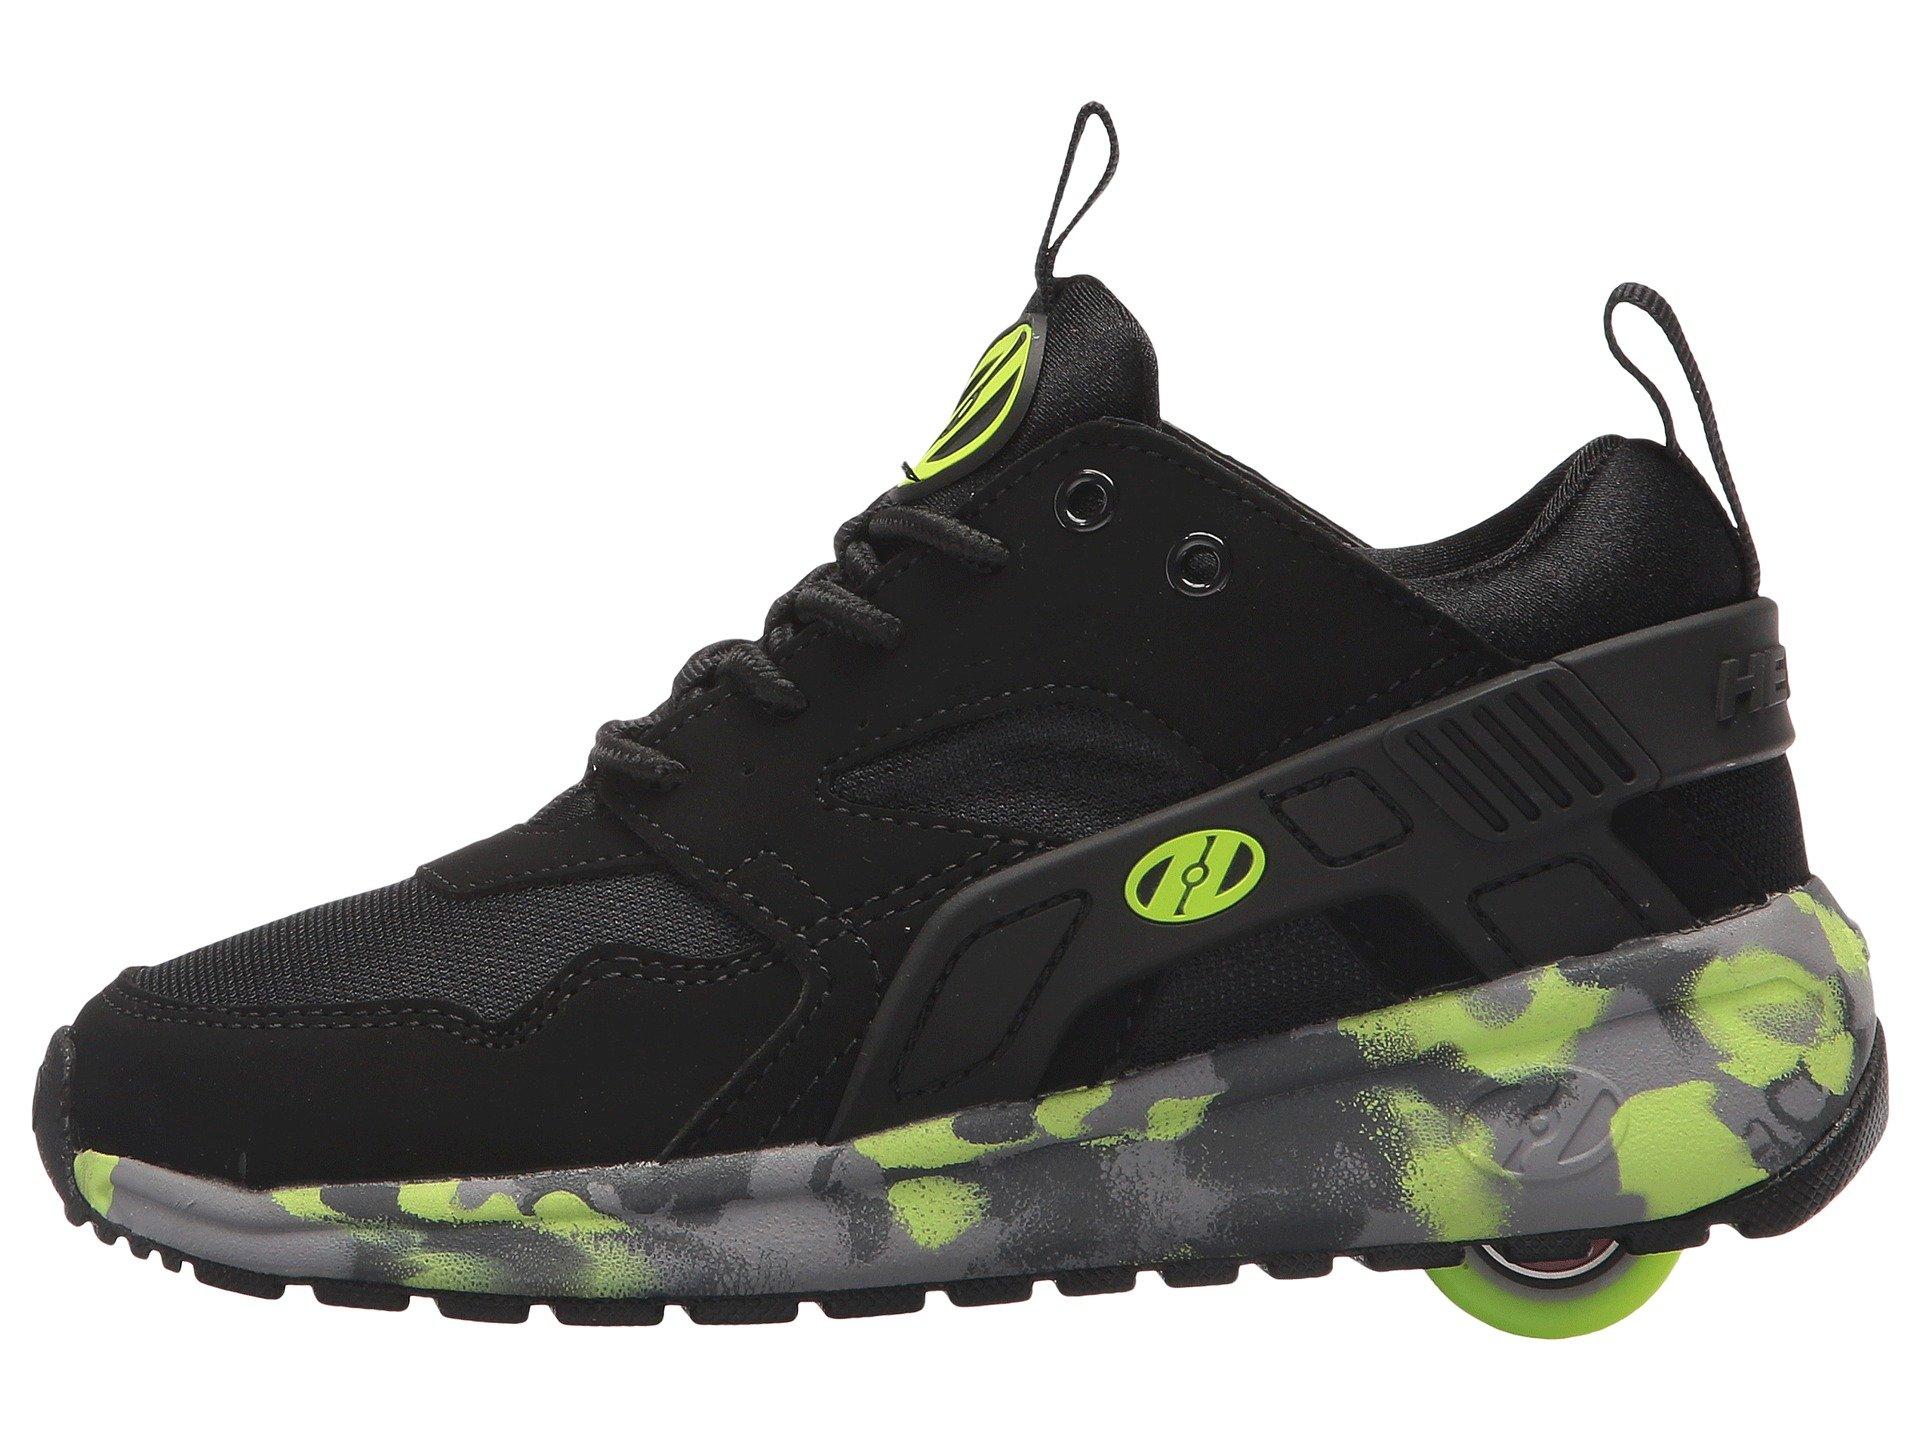 Heelys HE100095H Kid's Force Sneakers, Black/Brightyellow/Confet - 8 by Heelys (Image #6)